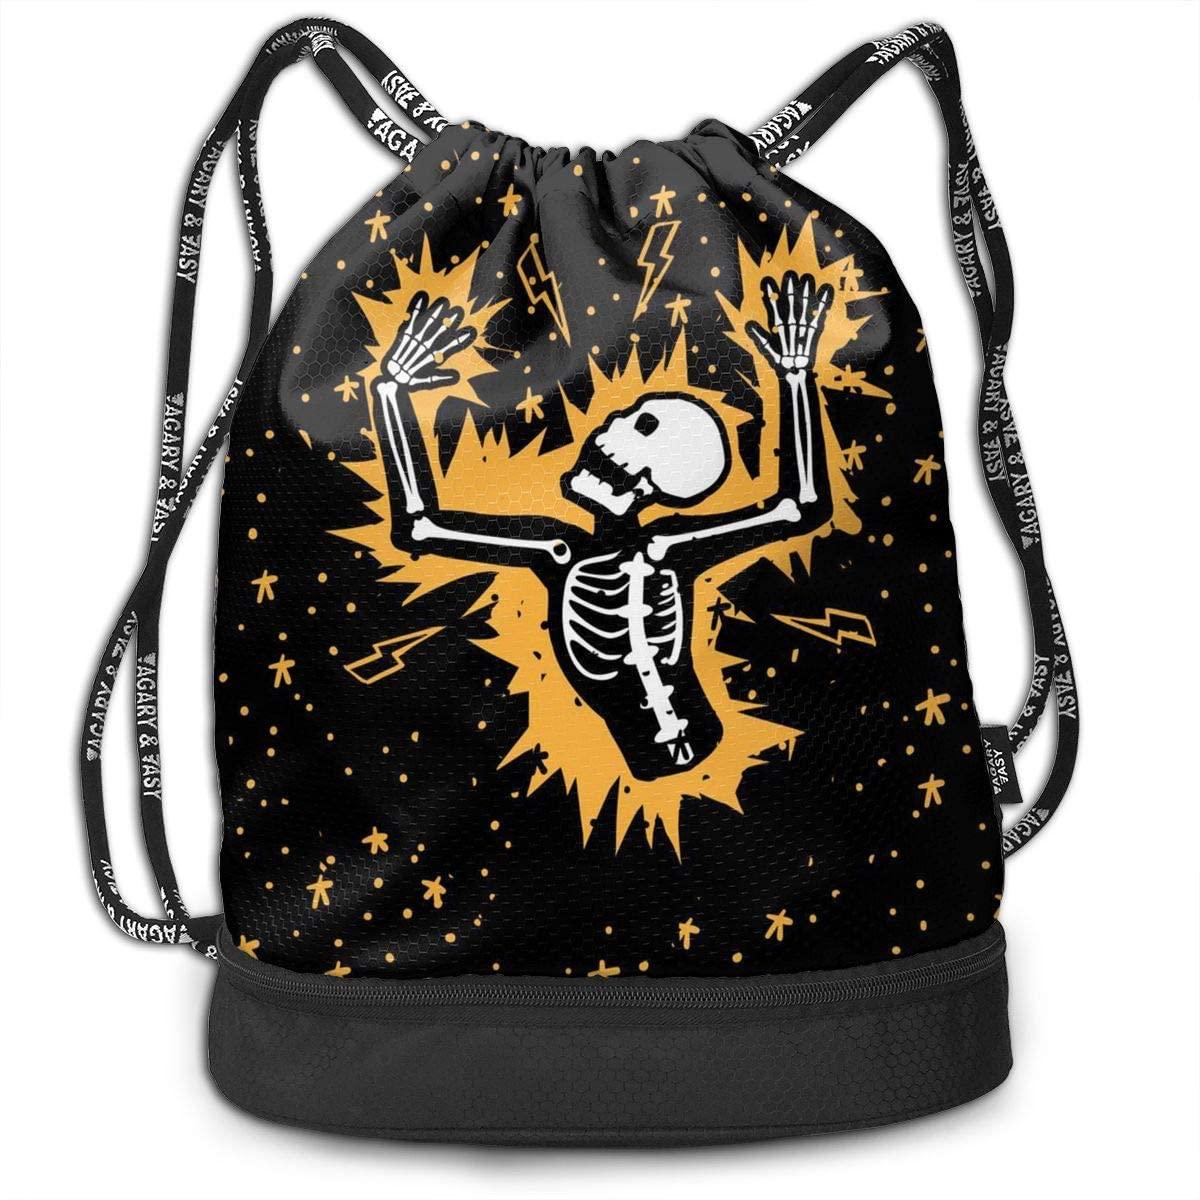 Bundle Backpacks Skull Rib Cage Skeleton Electric Shock Gym Sack Drawstring Bags Casual Daypack Yoga Bag School Training Pouch